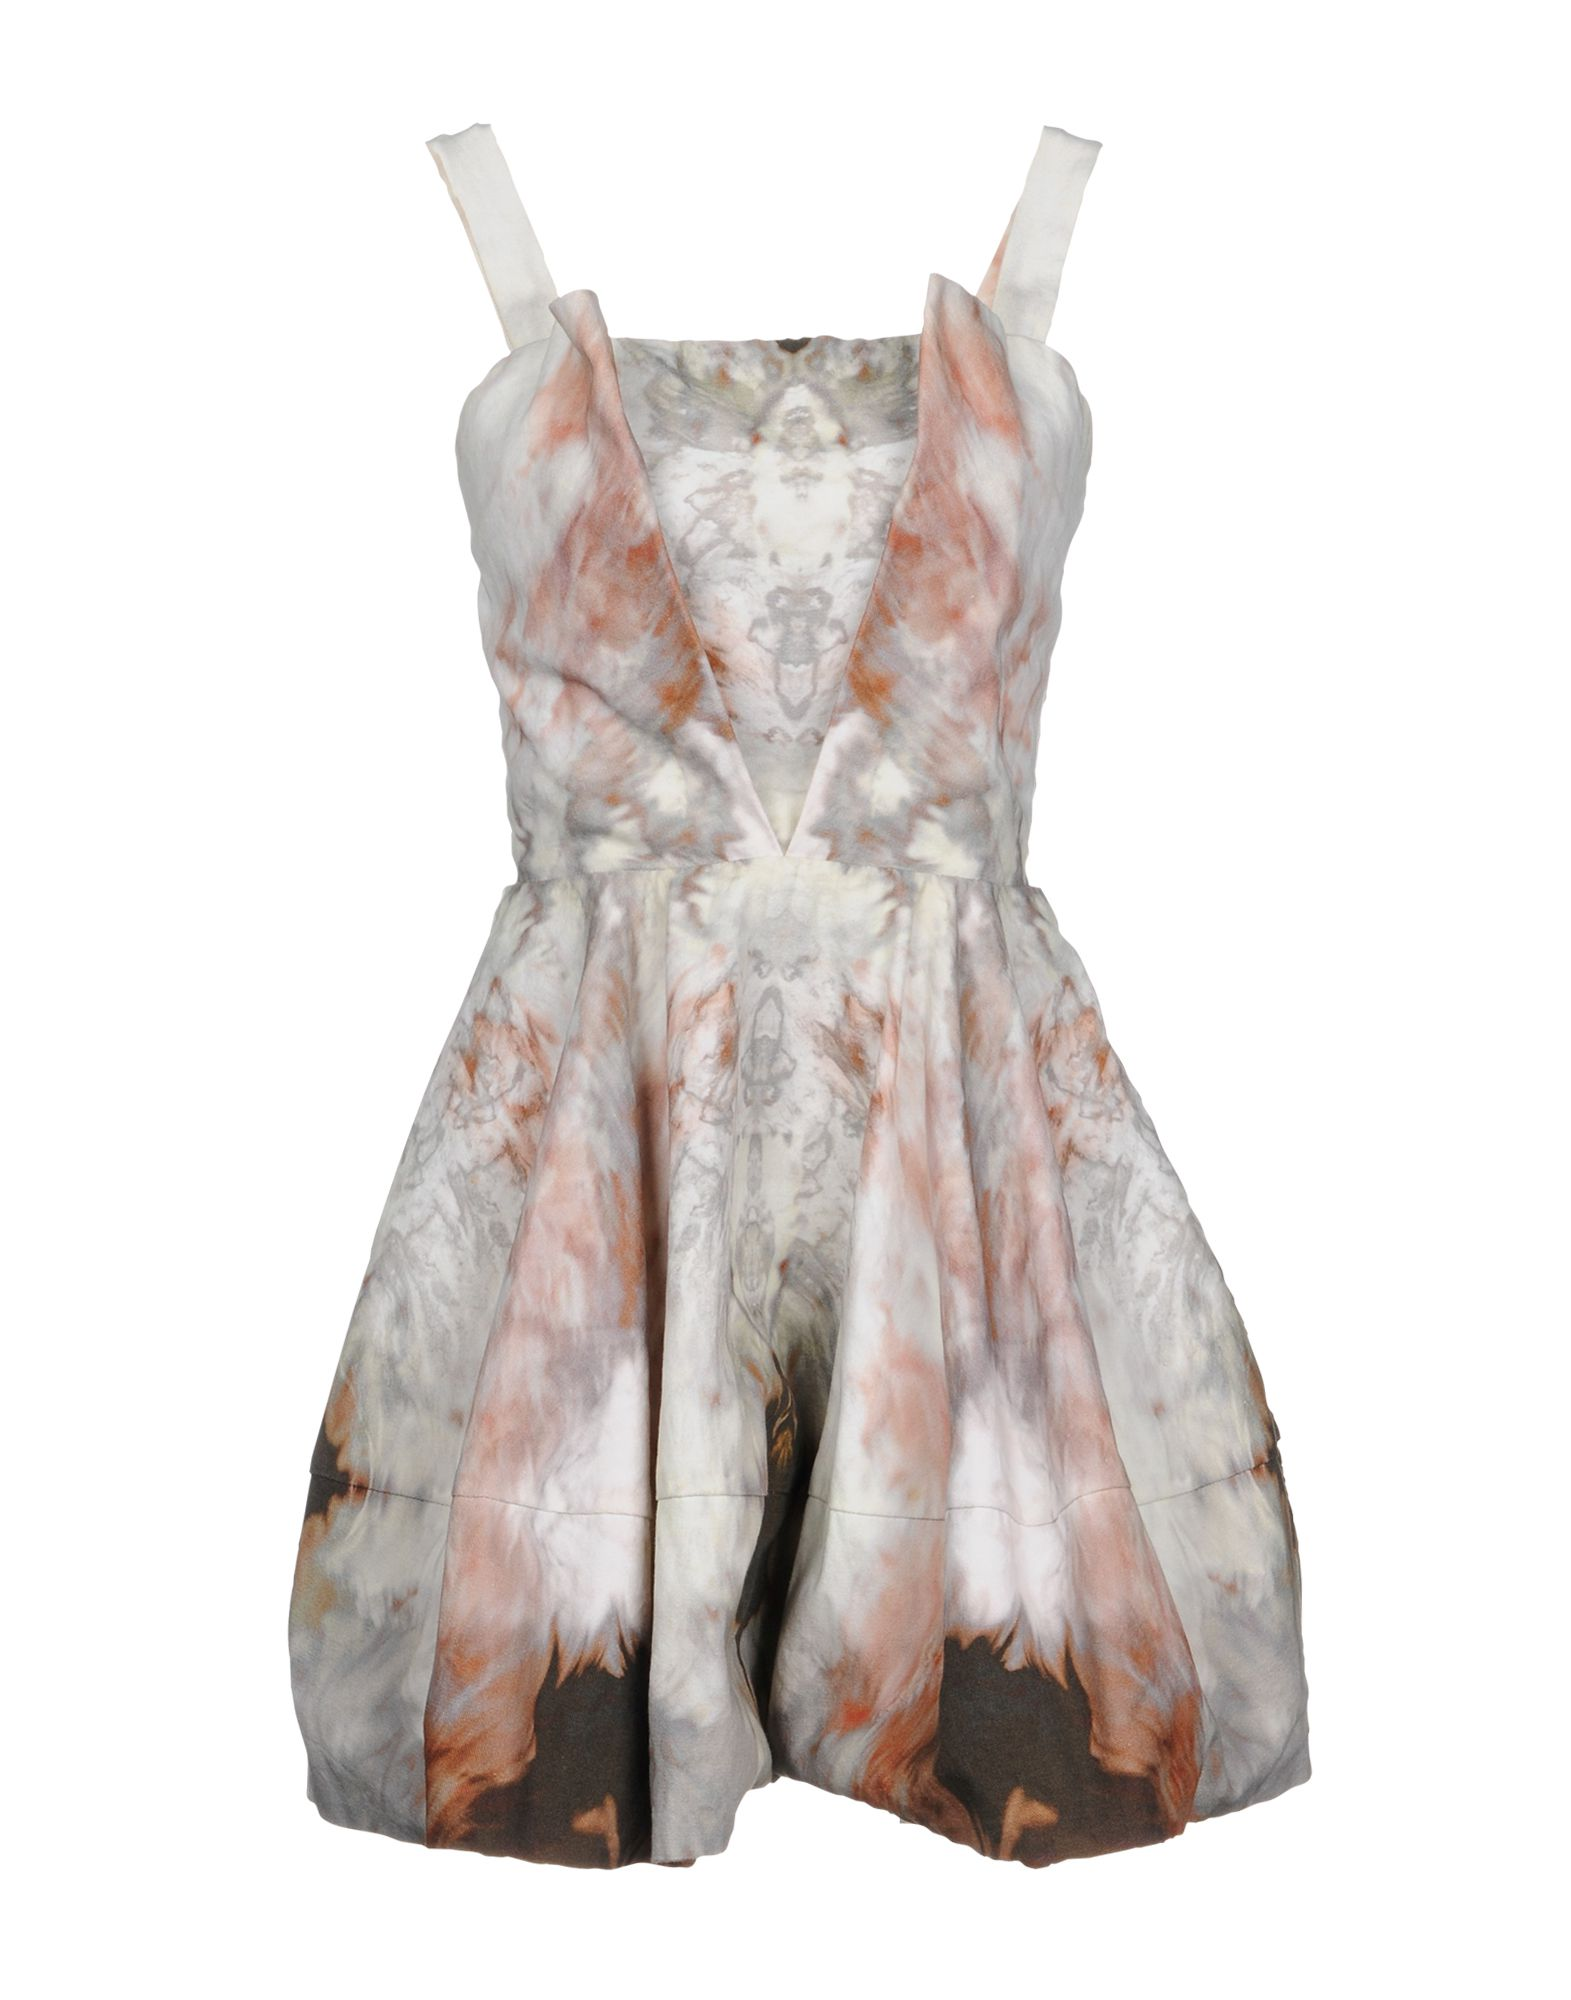 MARIA GRACHVOGEL Short Dress in Beige